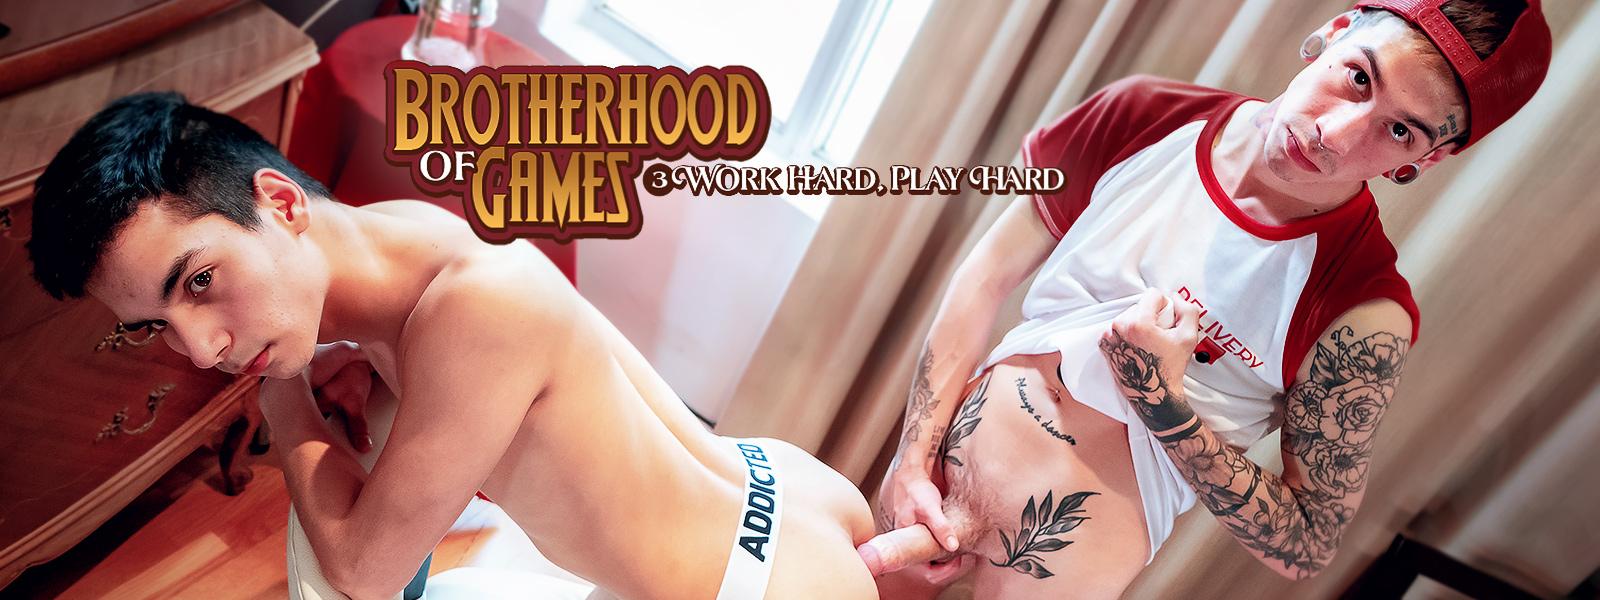 Brotherhood of Games | Ch. 3 Work Hard, Play Hard